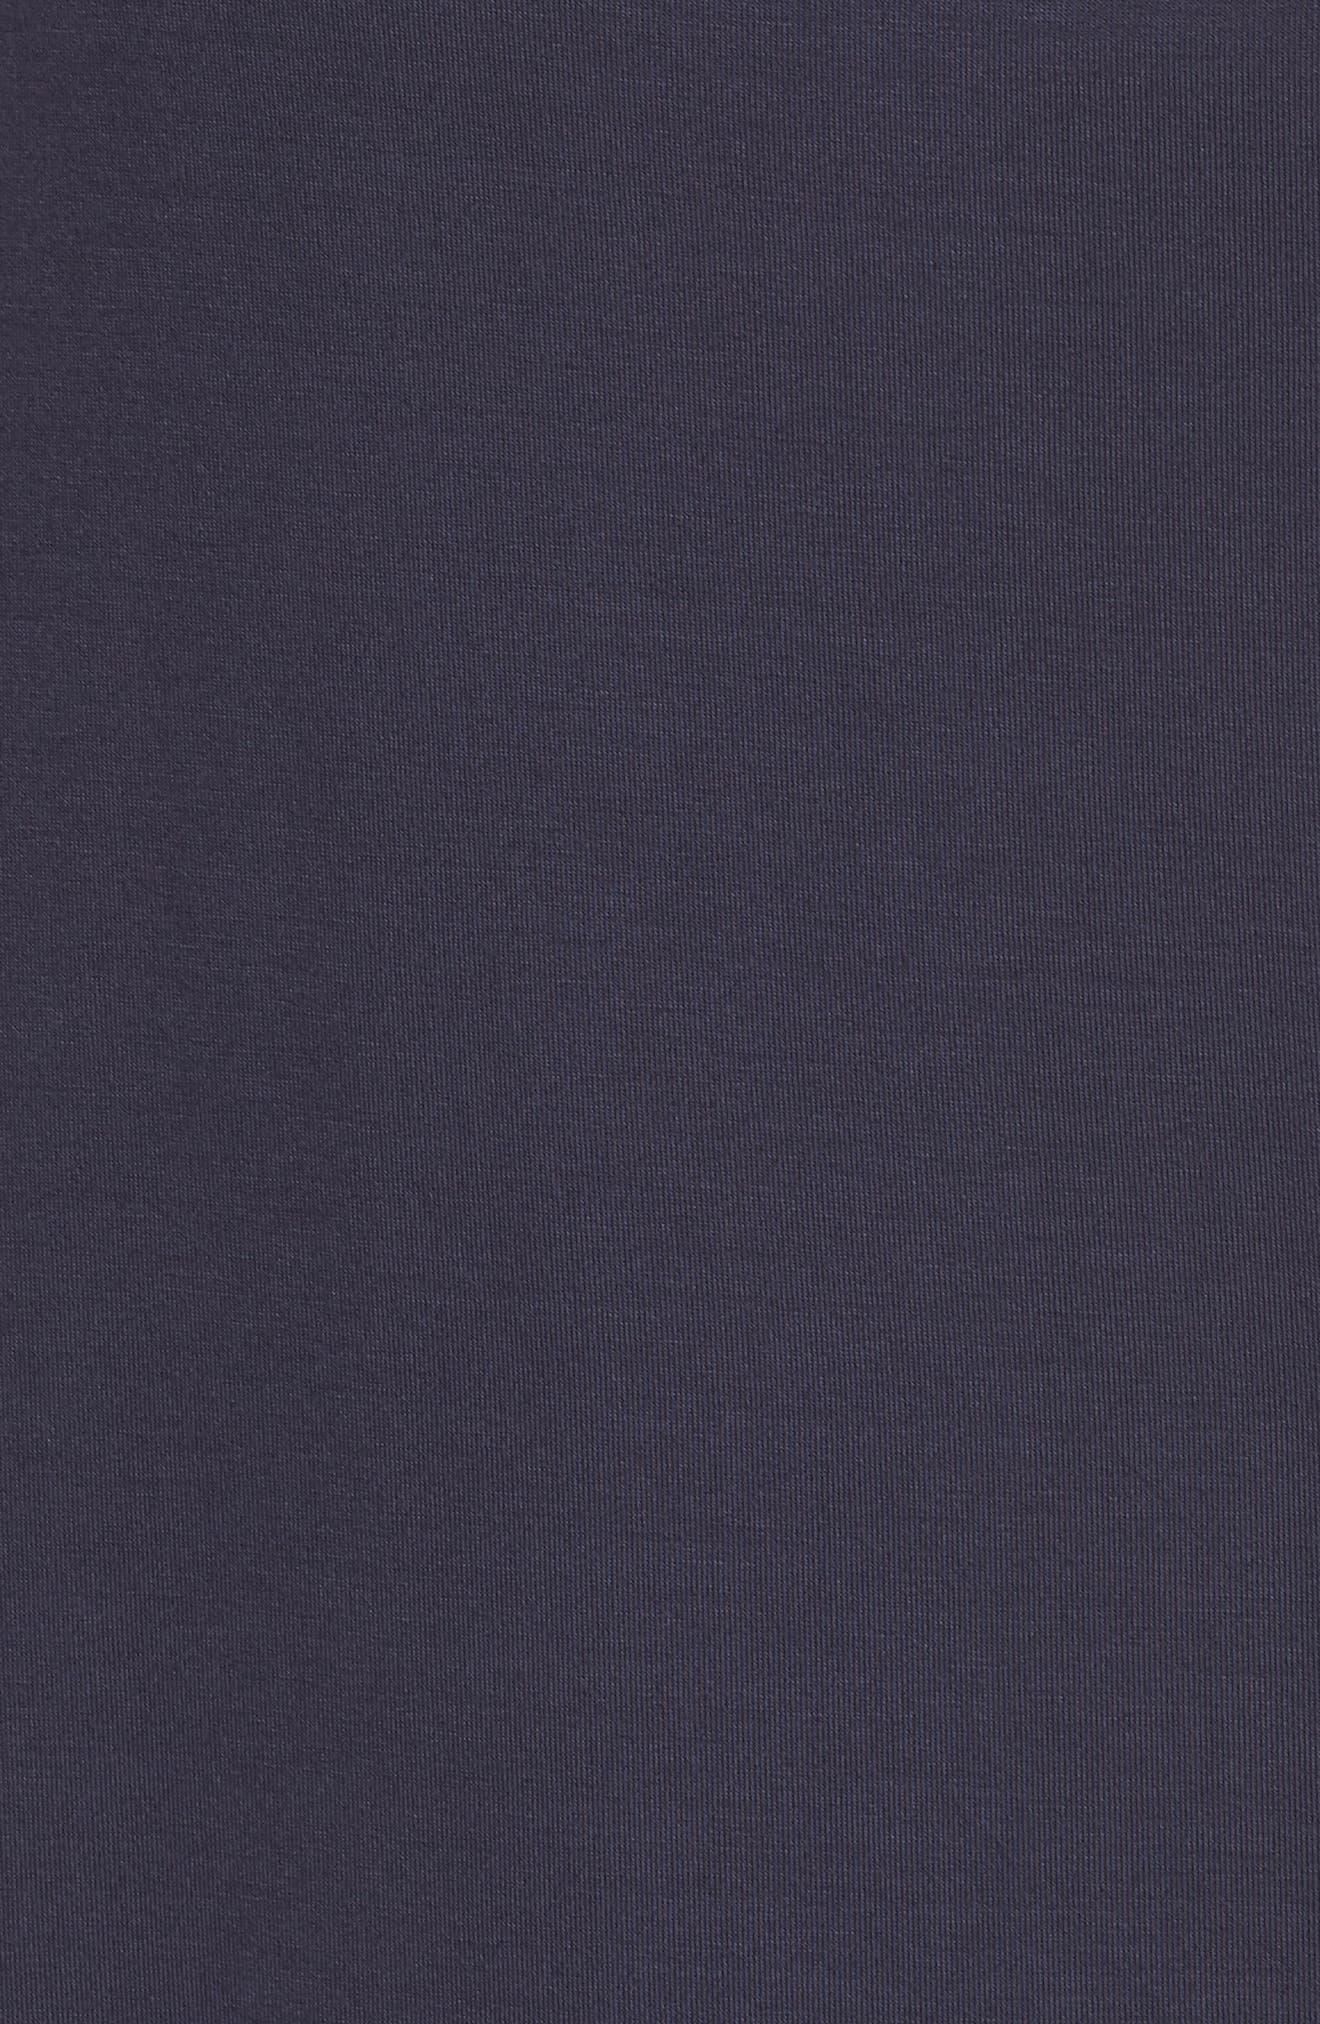 Feathers Essential Sleep Shirt,                             Alternate thumbnail 5, color,                             Night Blue